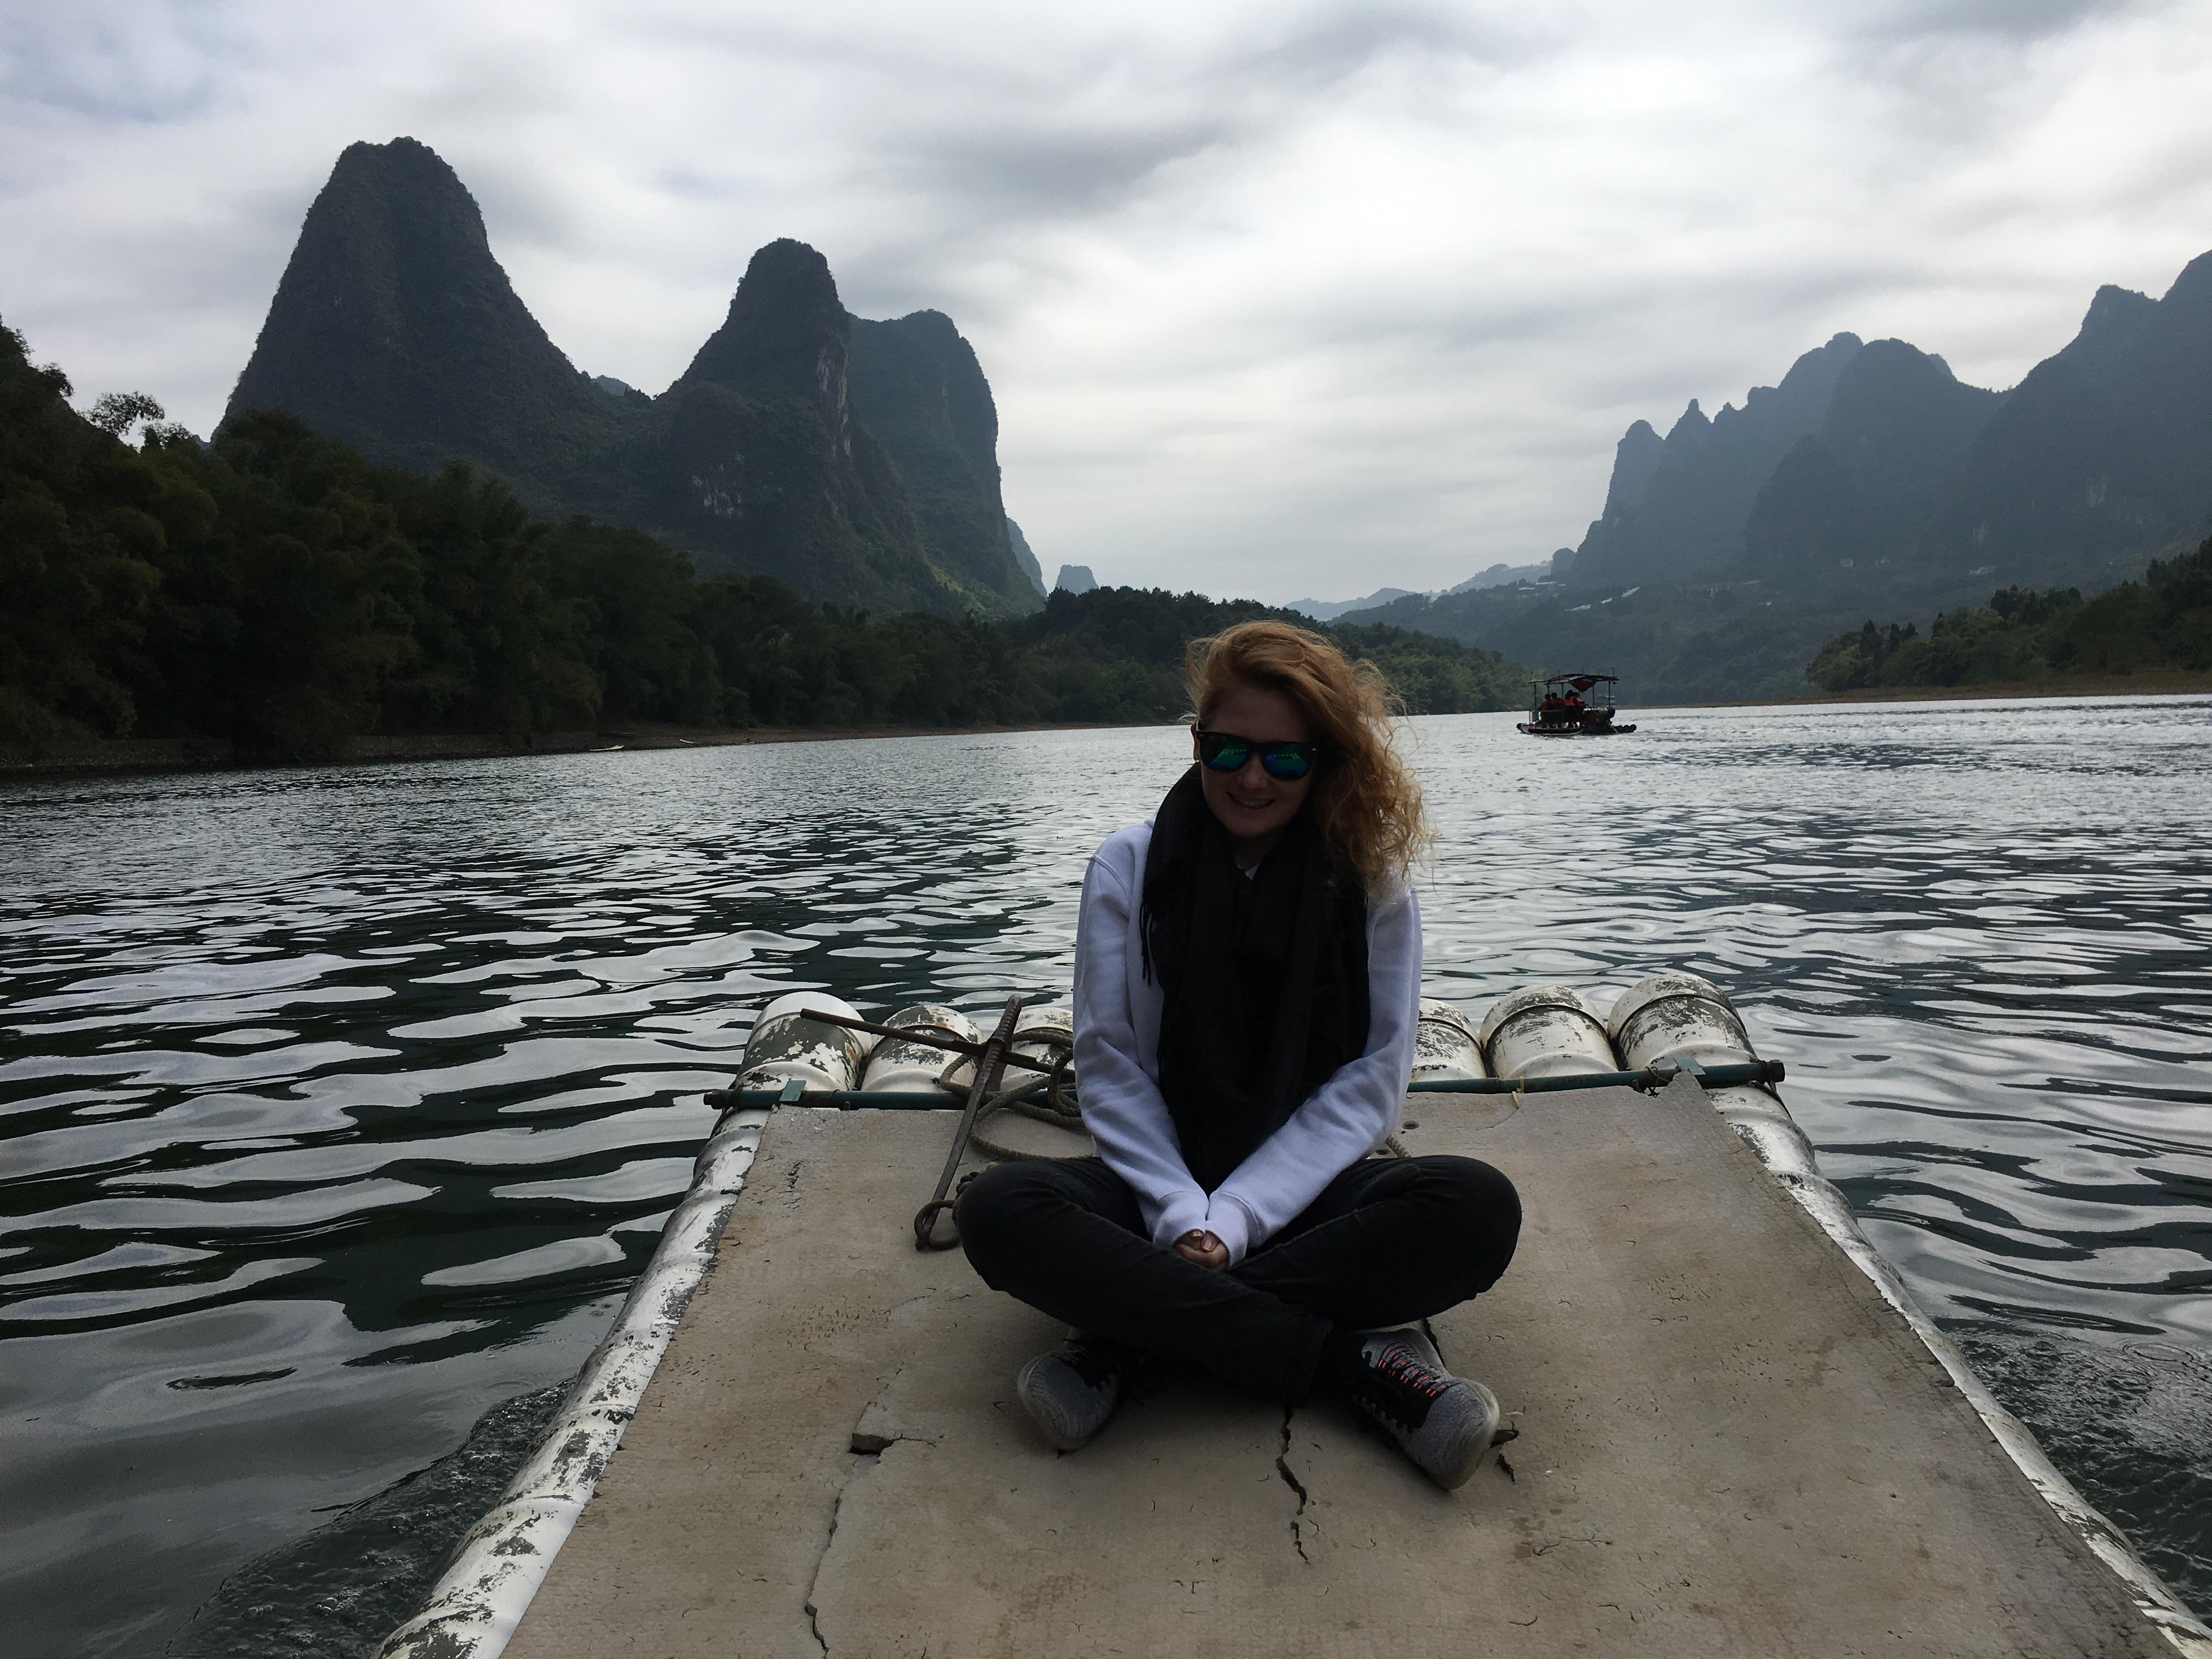 Bambusbootfahrt_Li River_Guilin